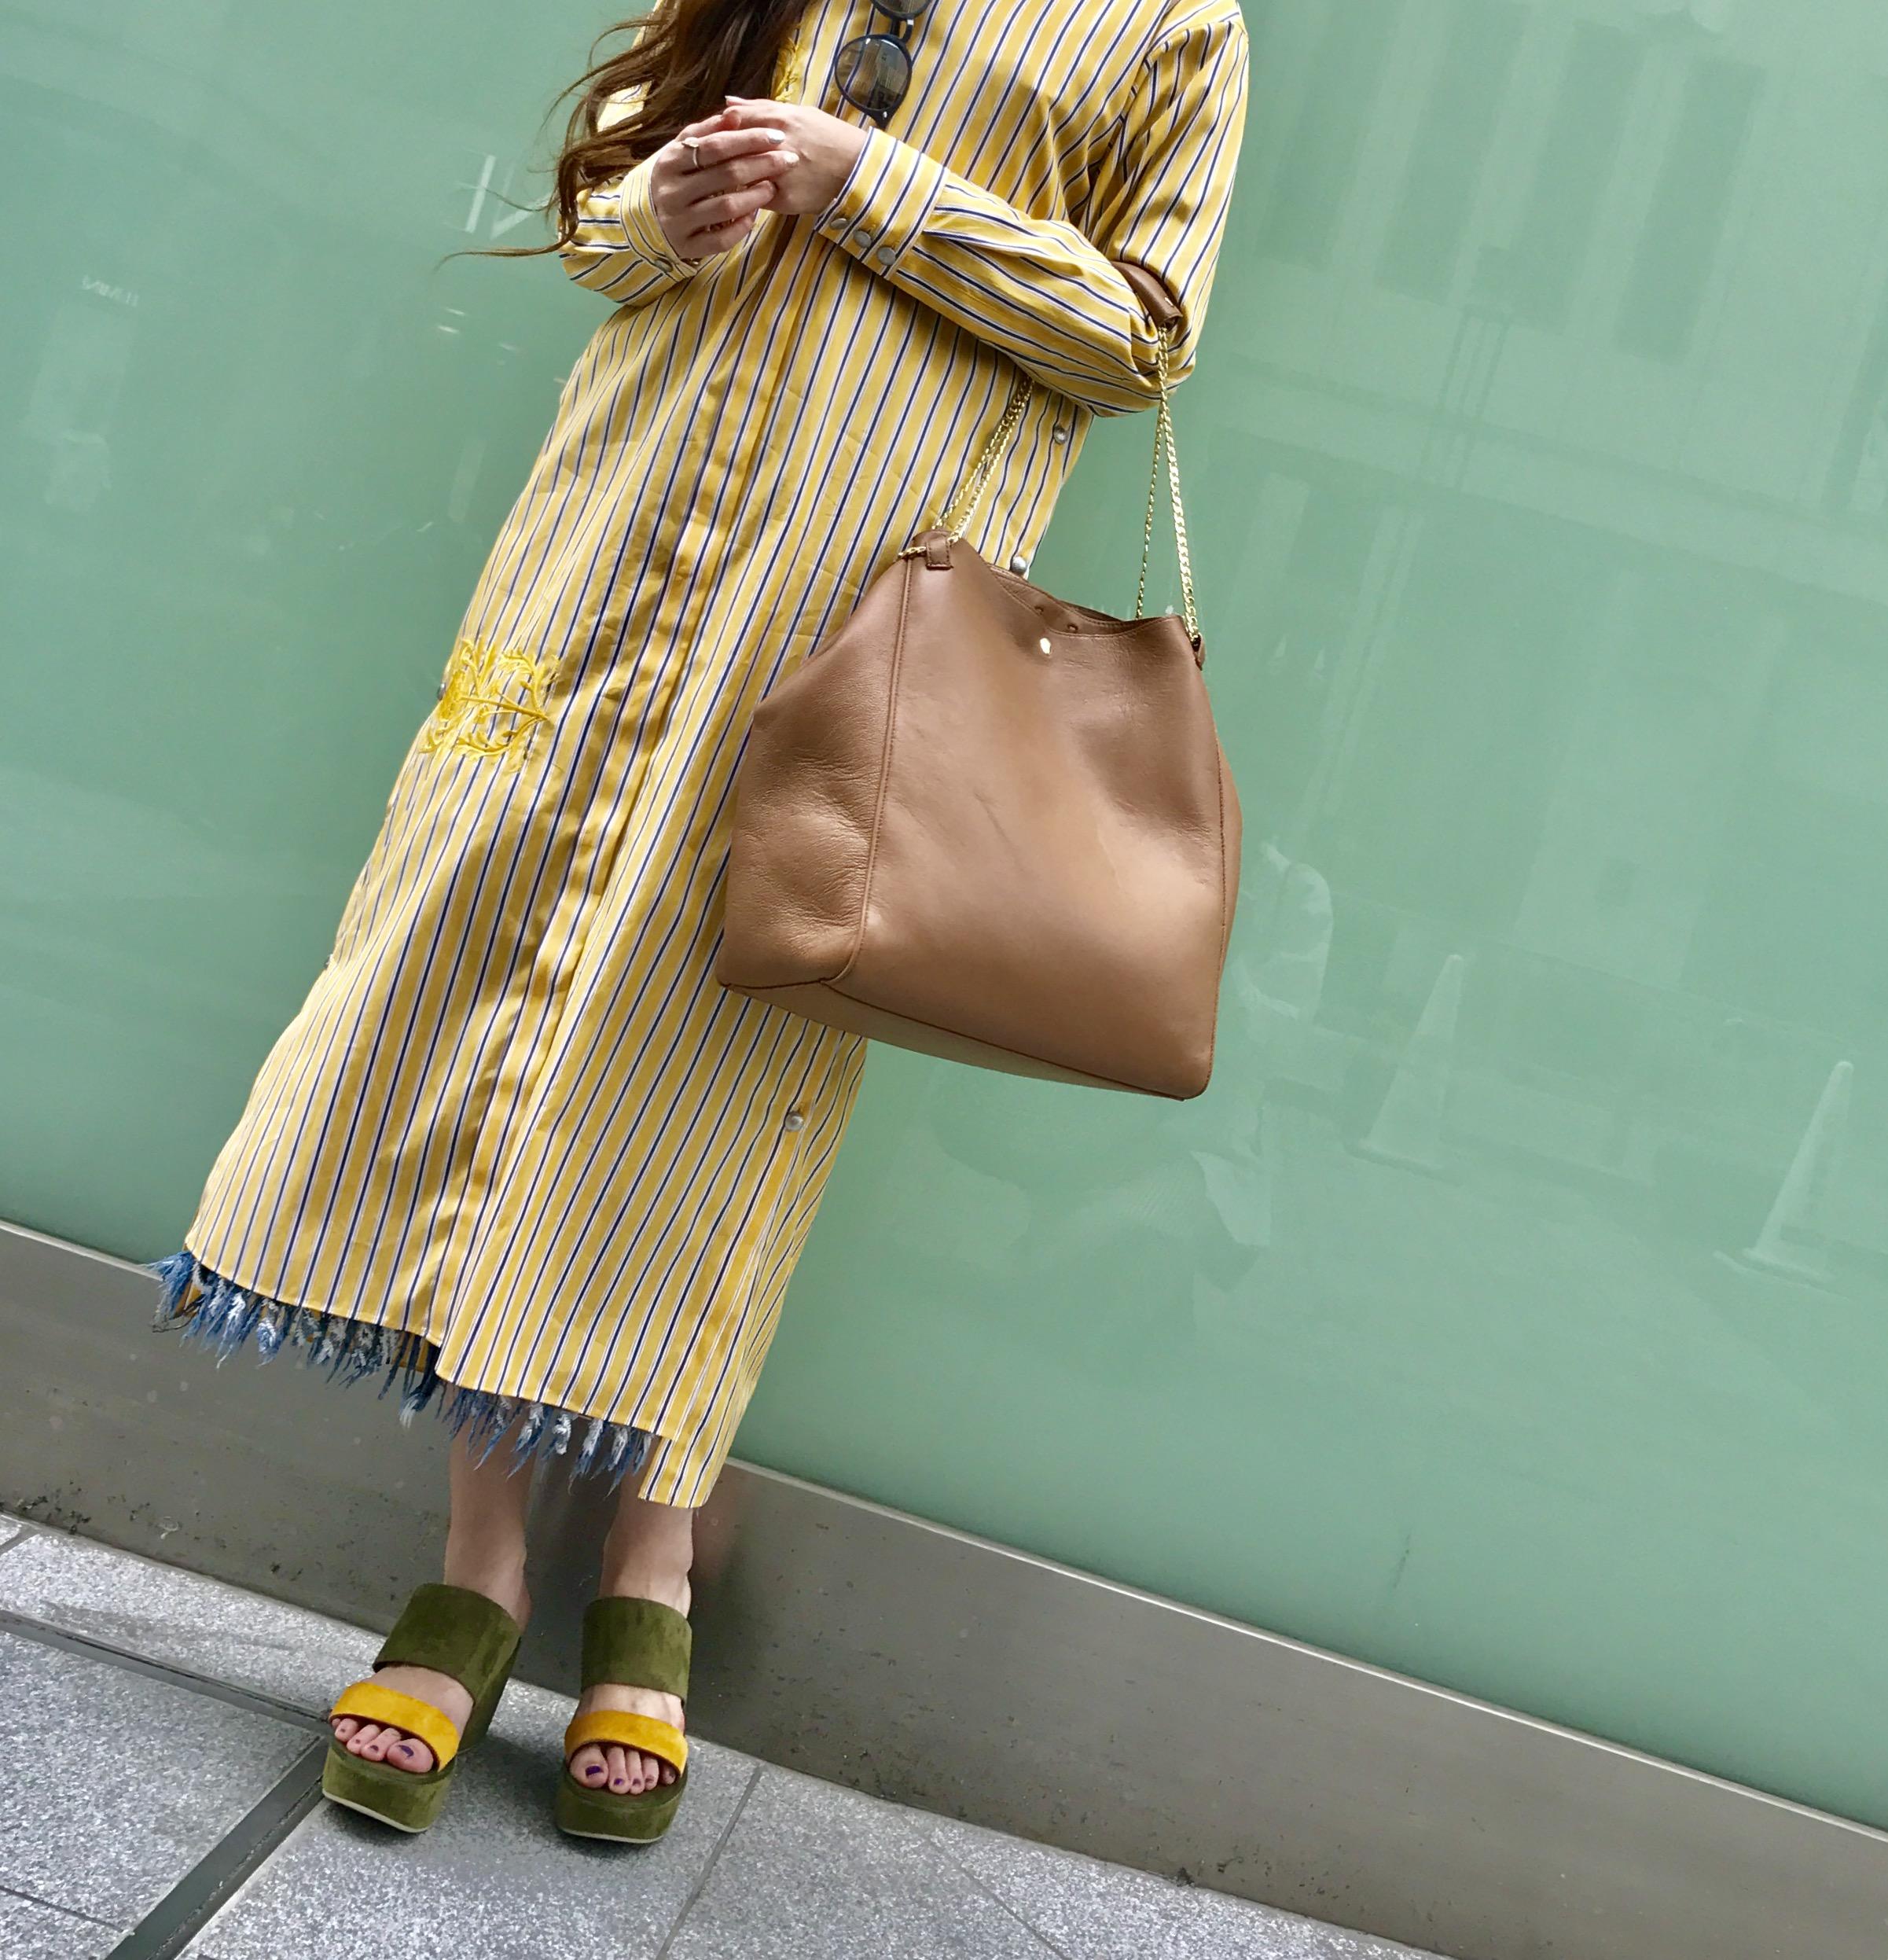 Donnaruma Scrap Book スクラップブック ドンナルンマ 有楽町マルイ 可愛い tote bag トートバッグ 軽い レザーバッグ leather bag 日本ブランド お仕事用